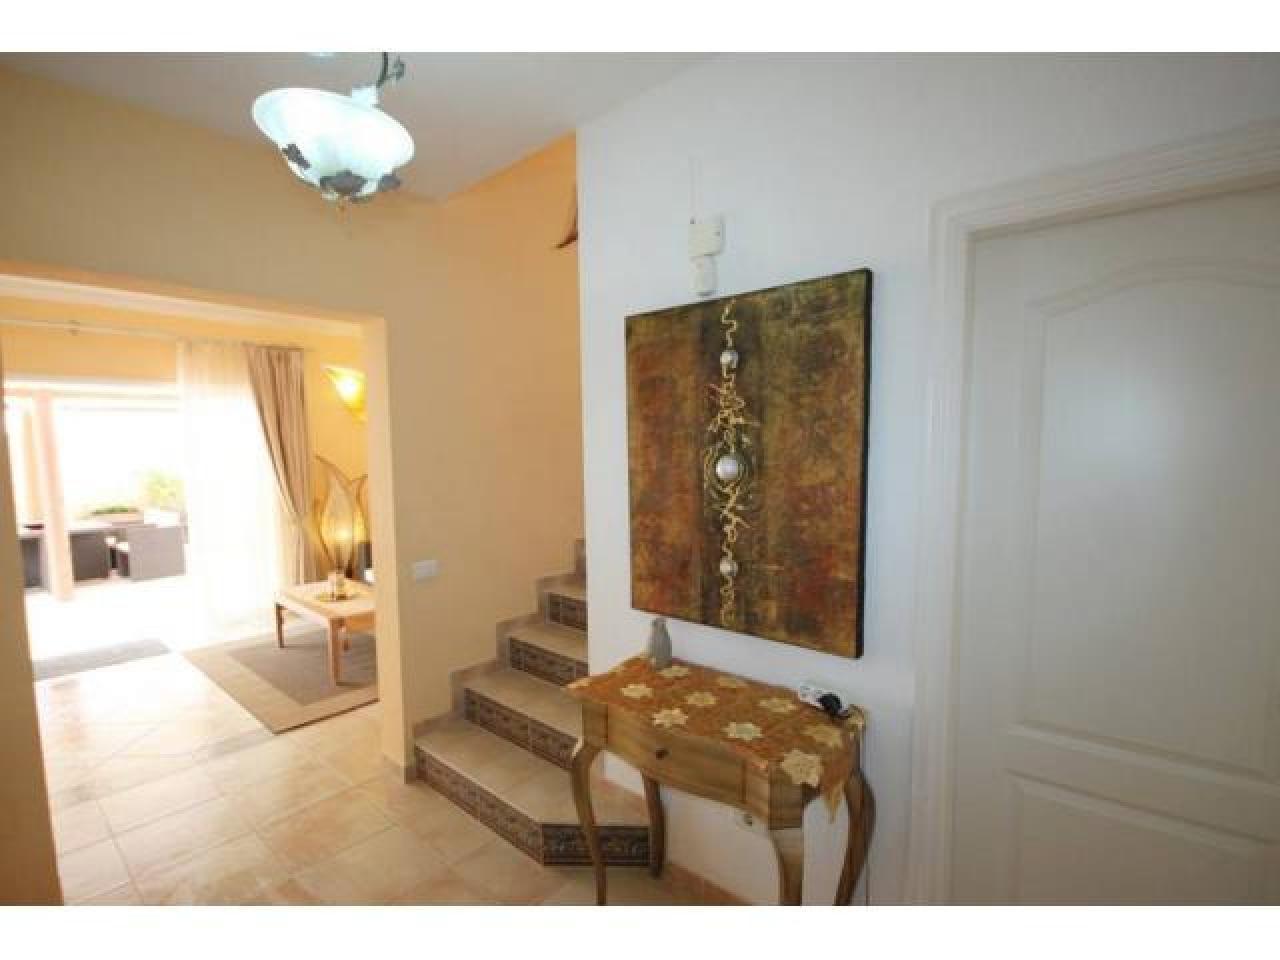 Villa in Tenerife for rent, in Costa Adeje, Madronal de Fanabe - 4